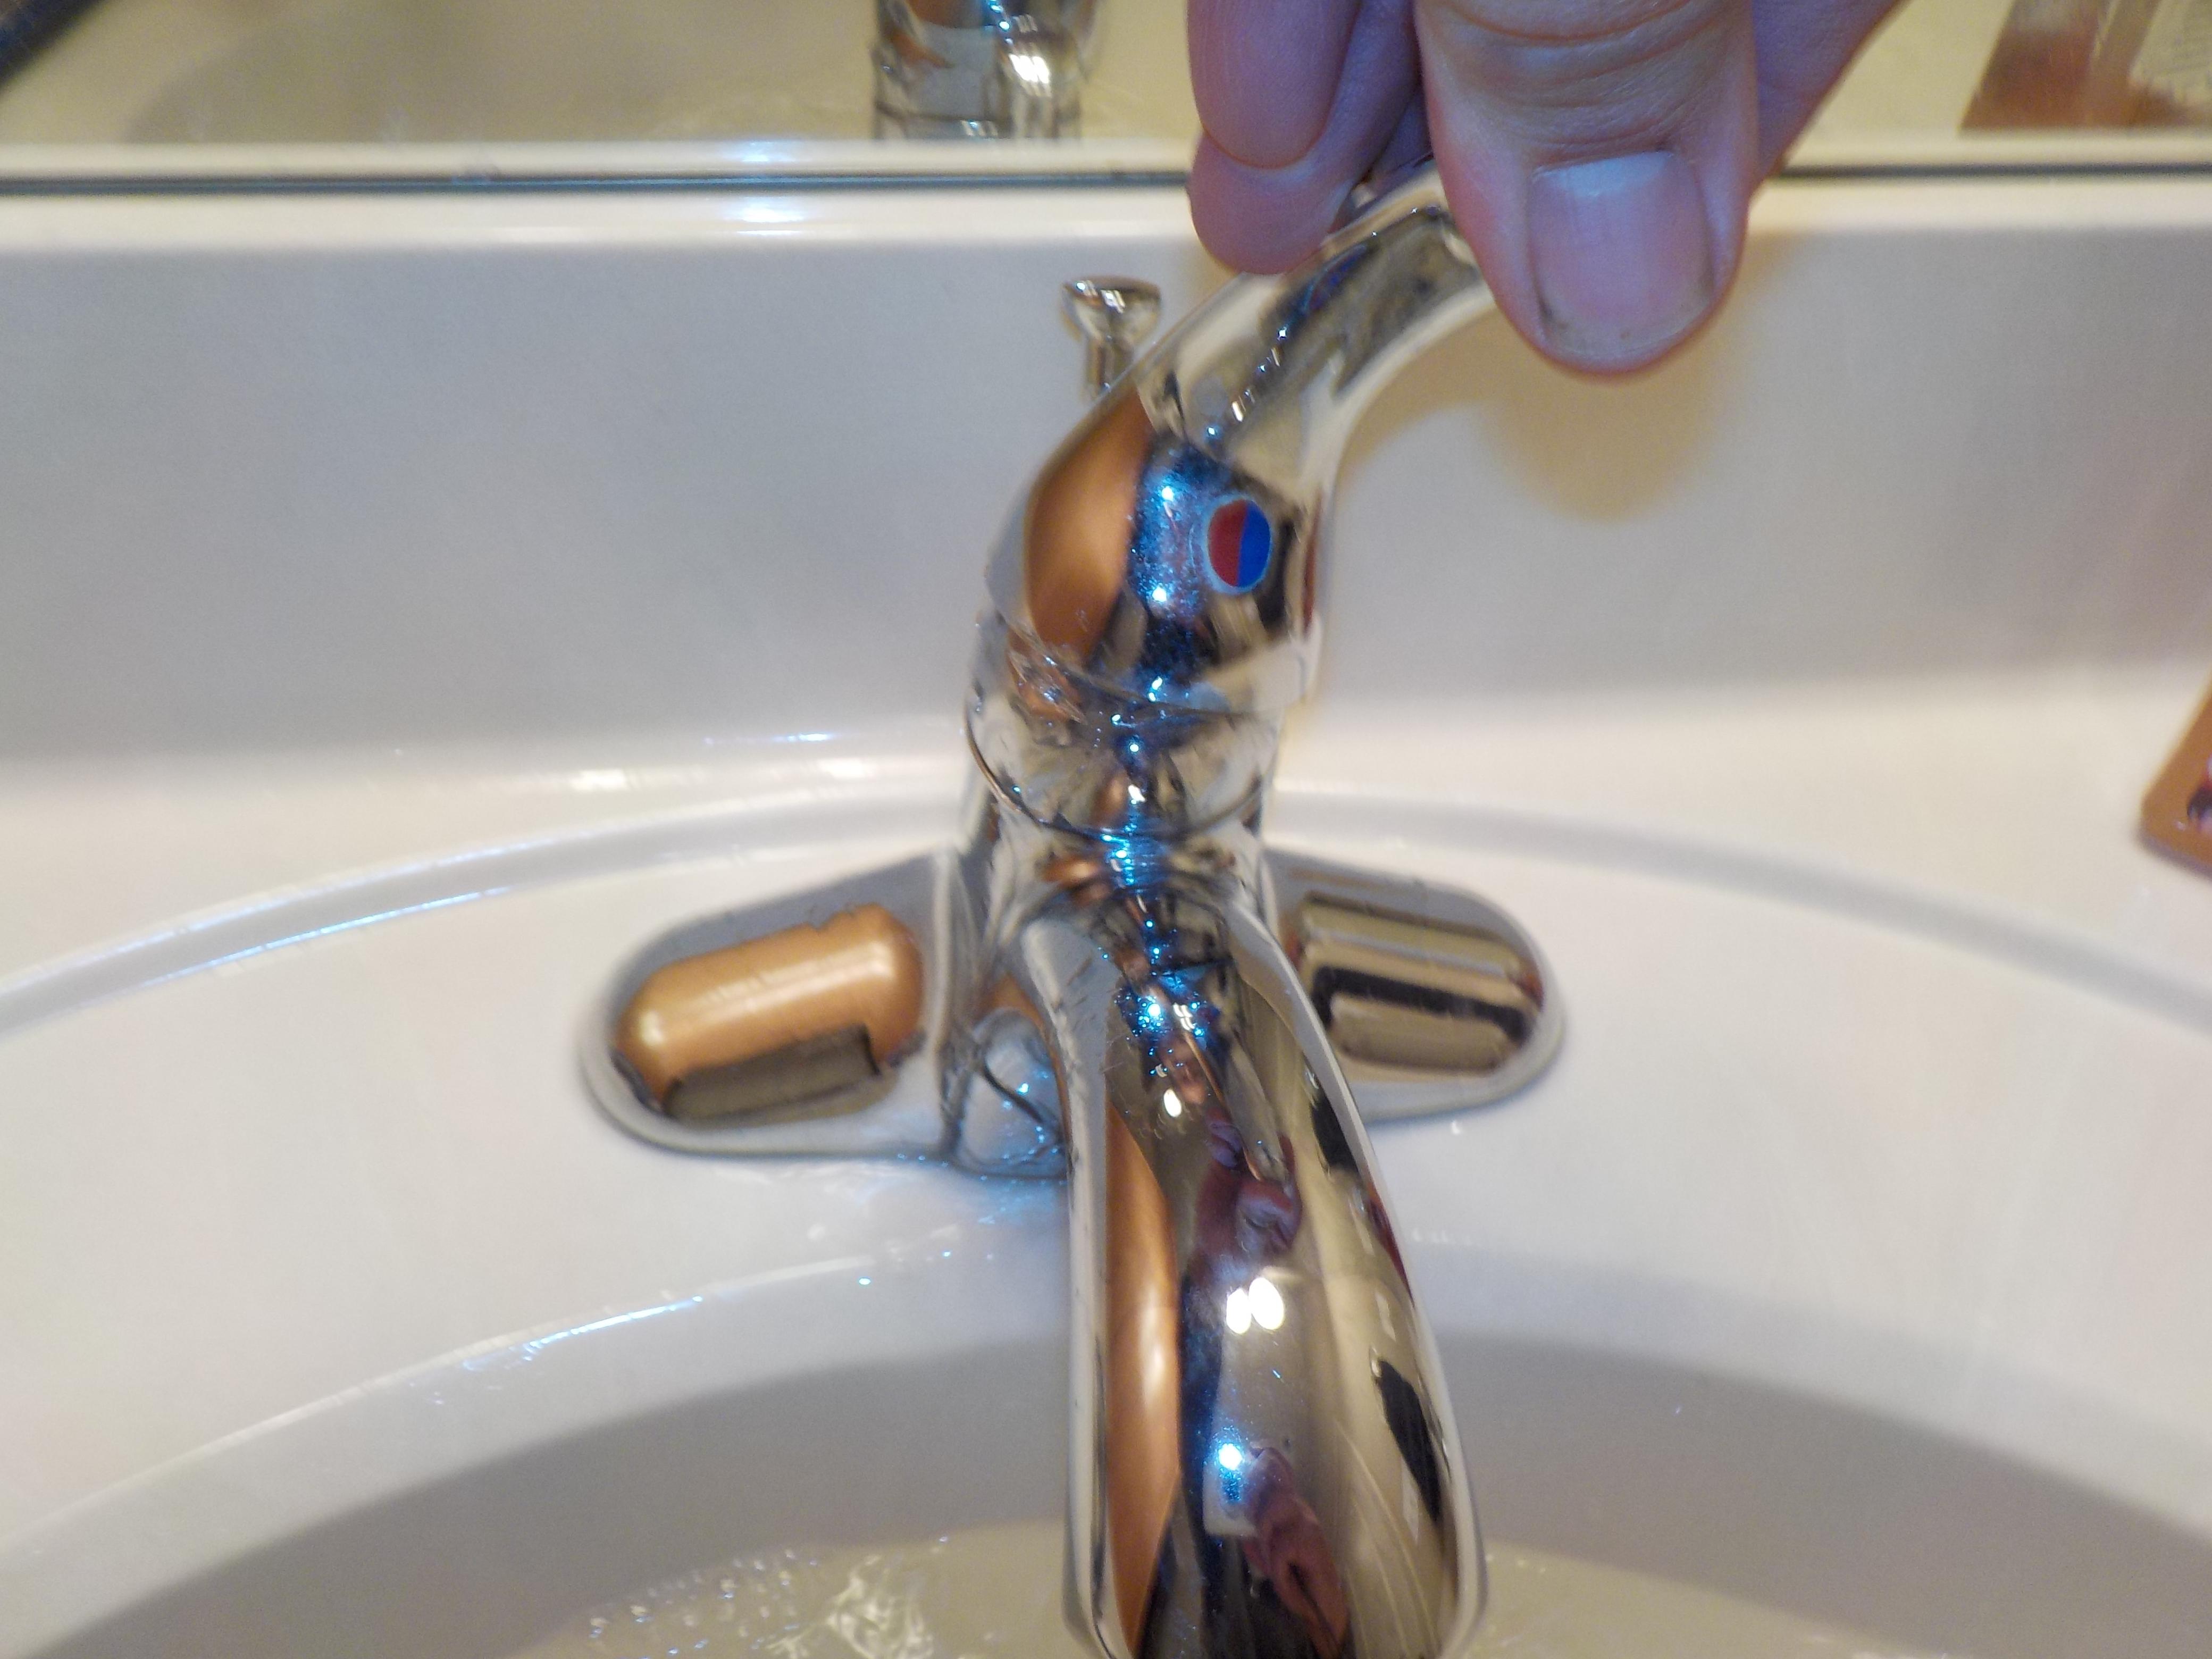 Leaking faucet - Chelsea